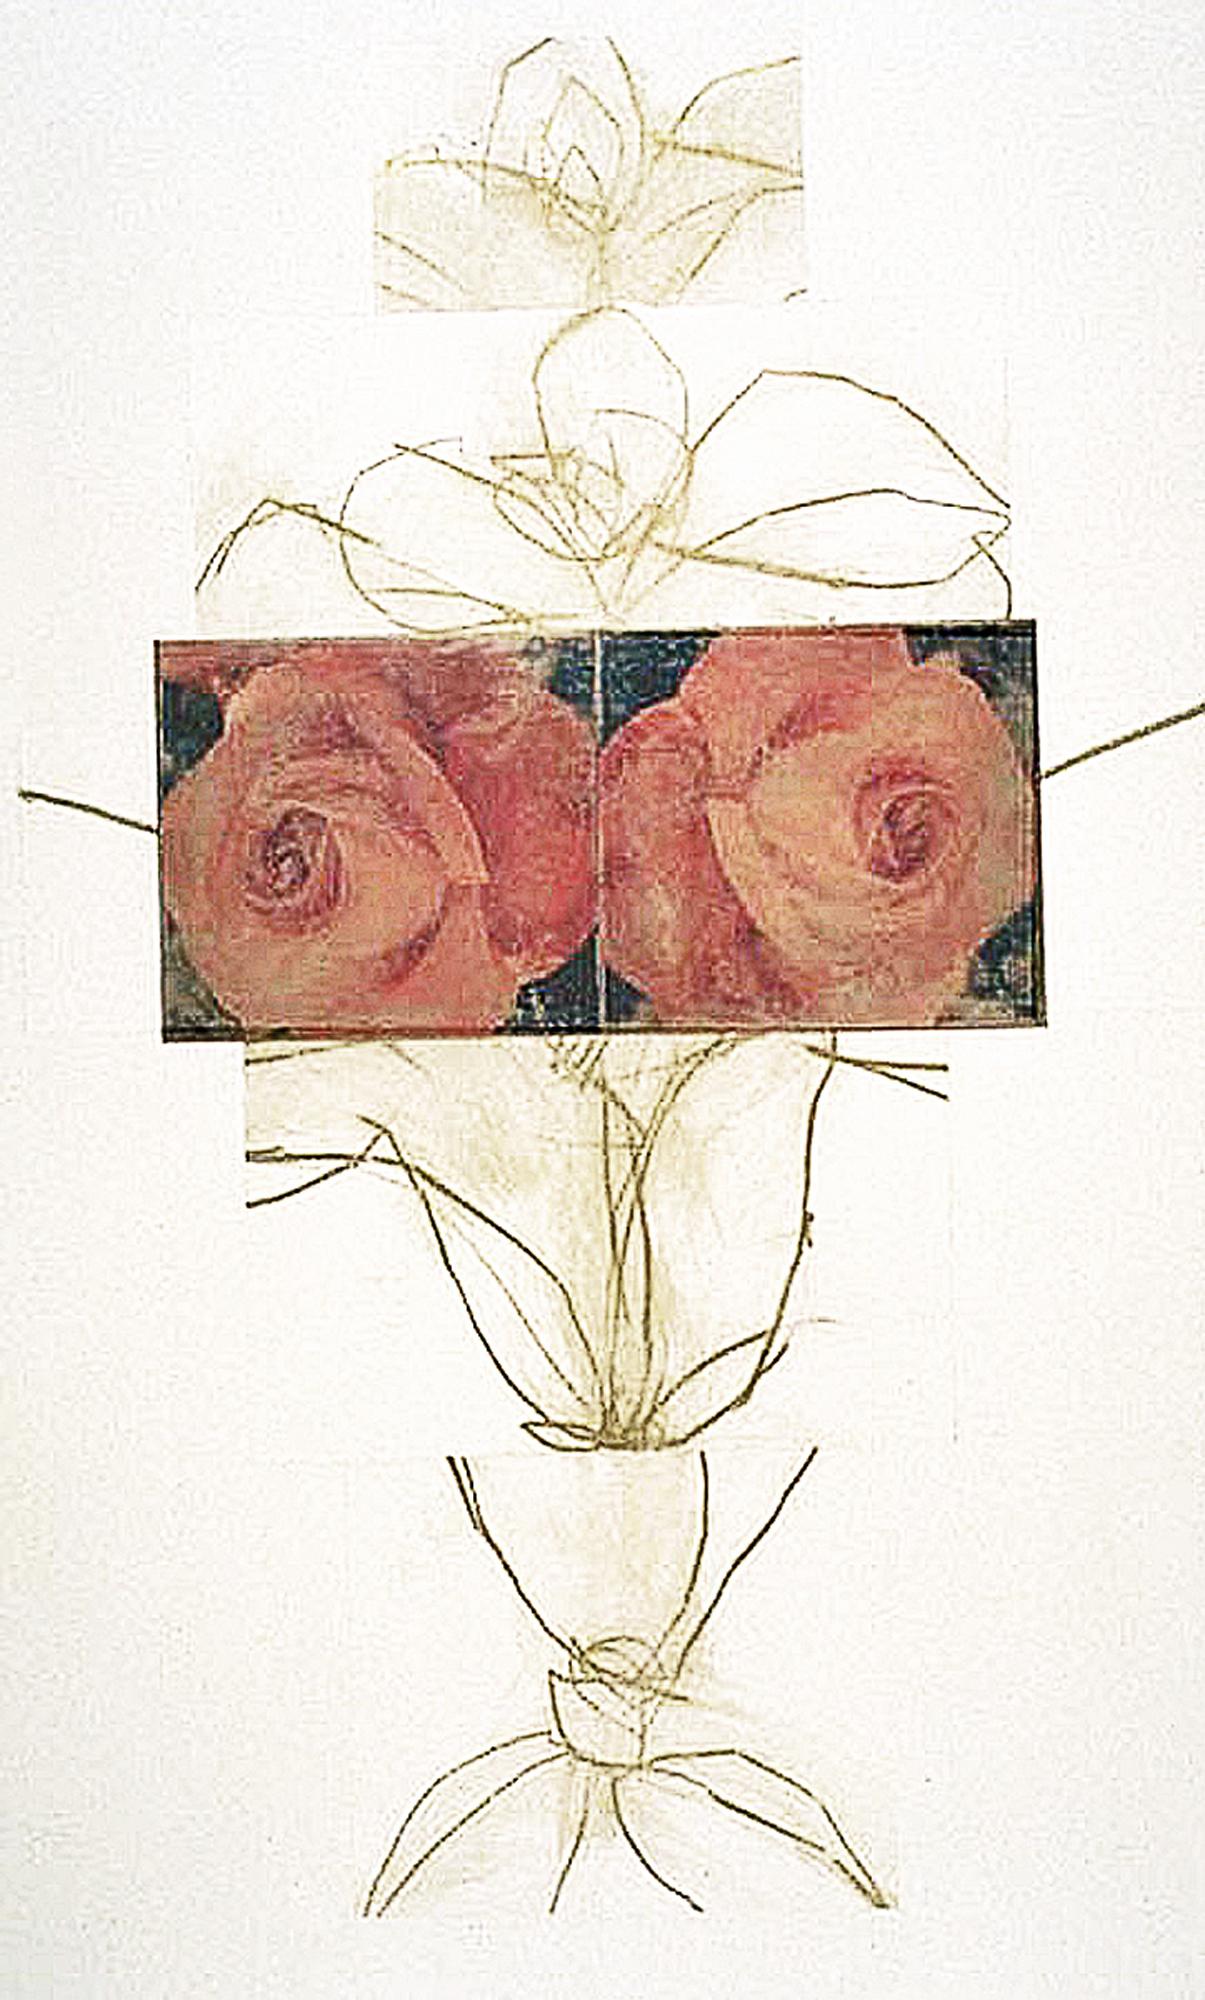 11september2001_rose_cantataforhealing_2001_clj_wp2